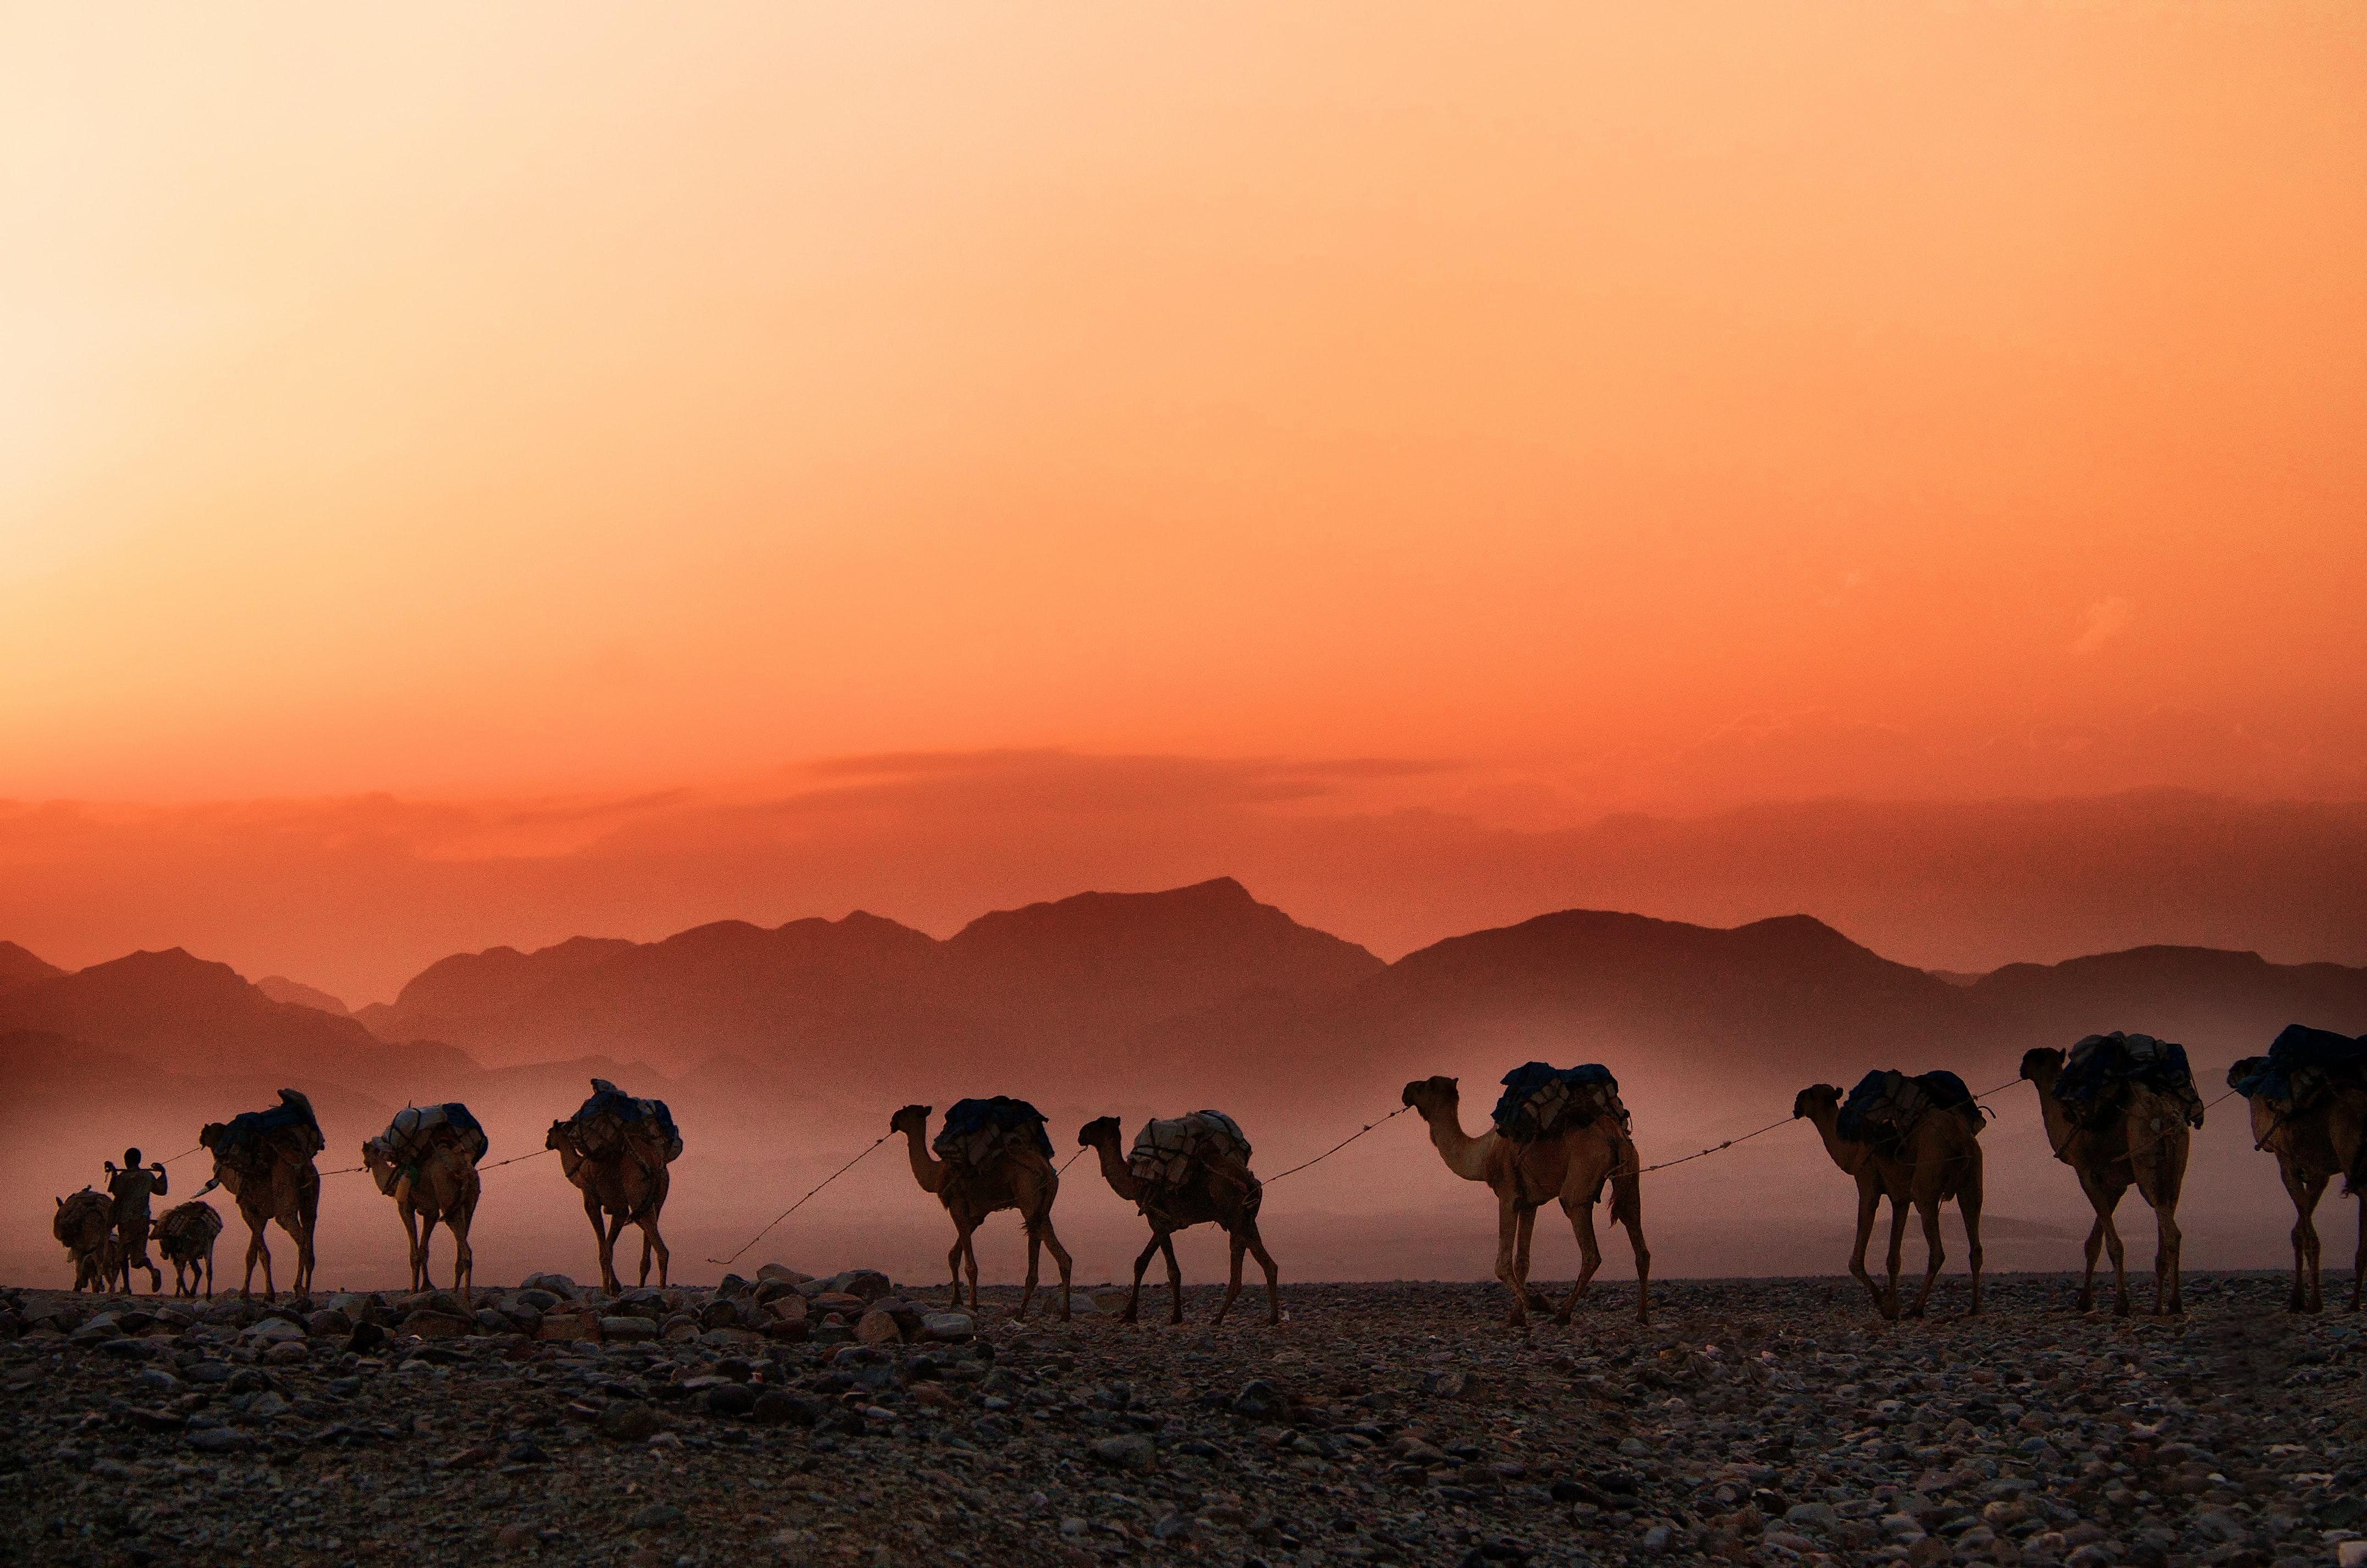 A caravan of camels at sunset - Goal Success Program